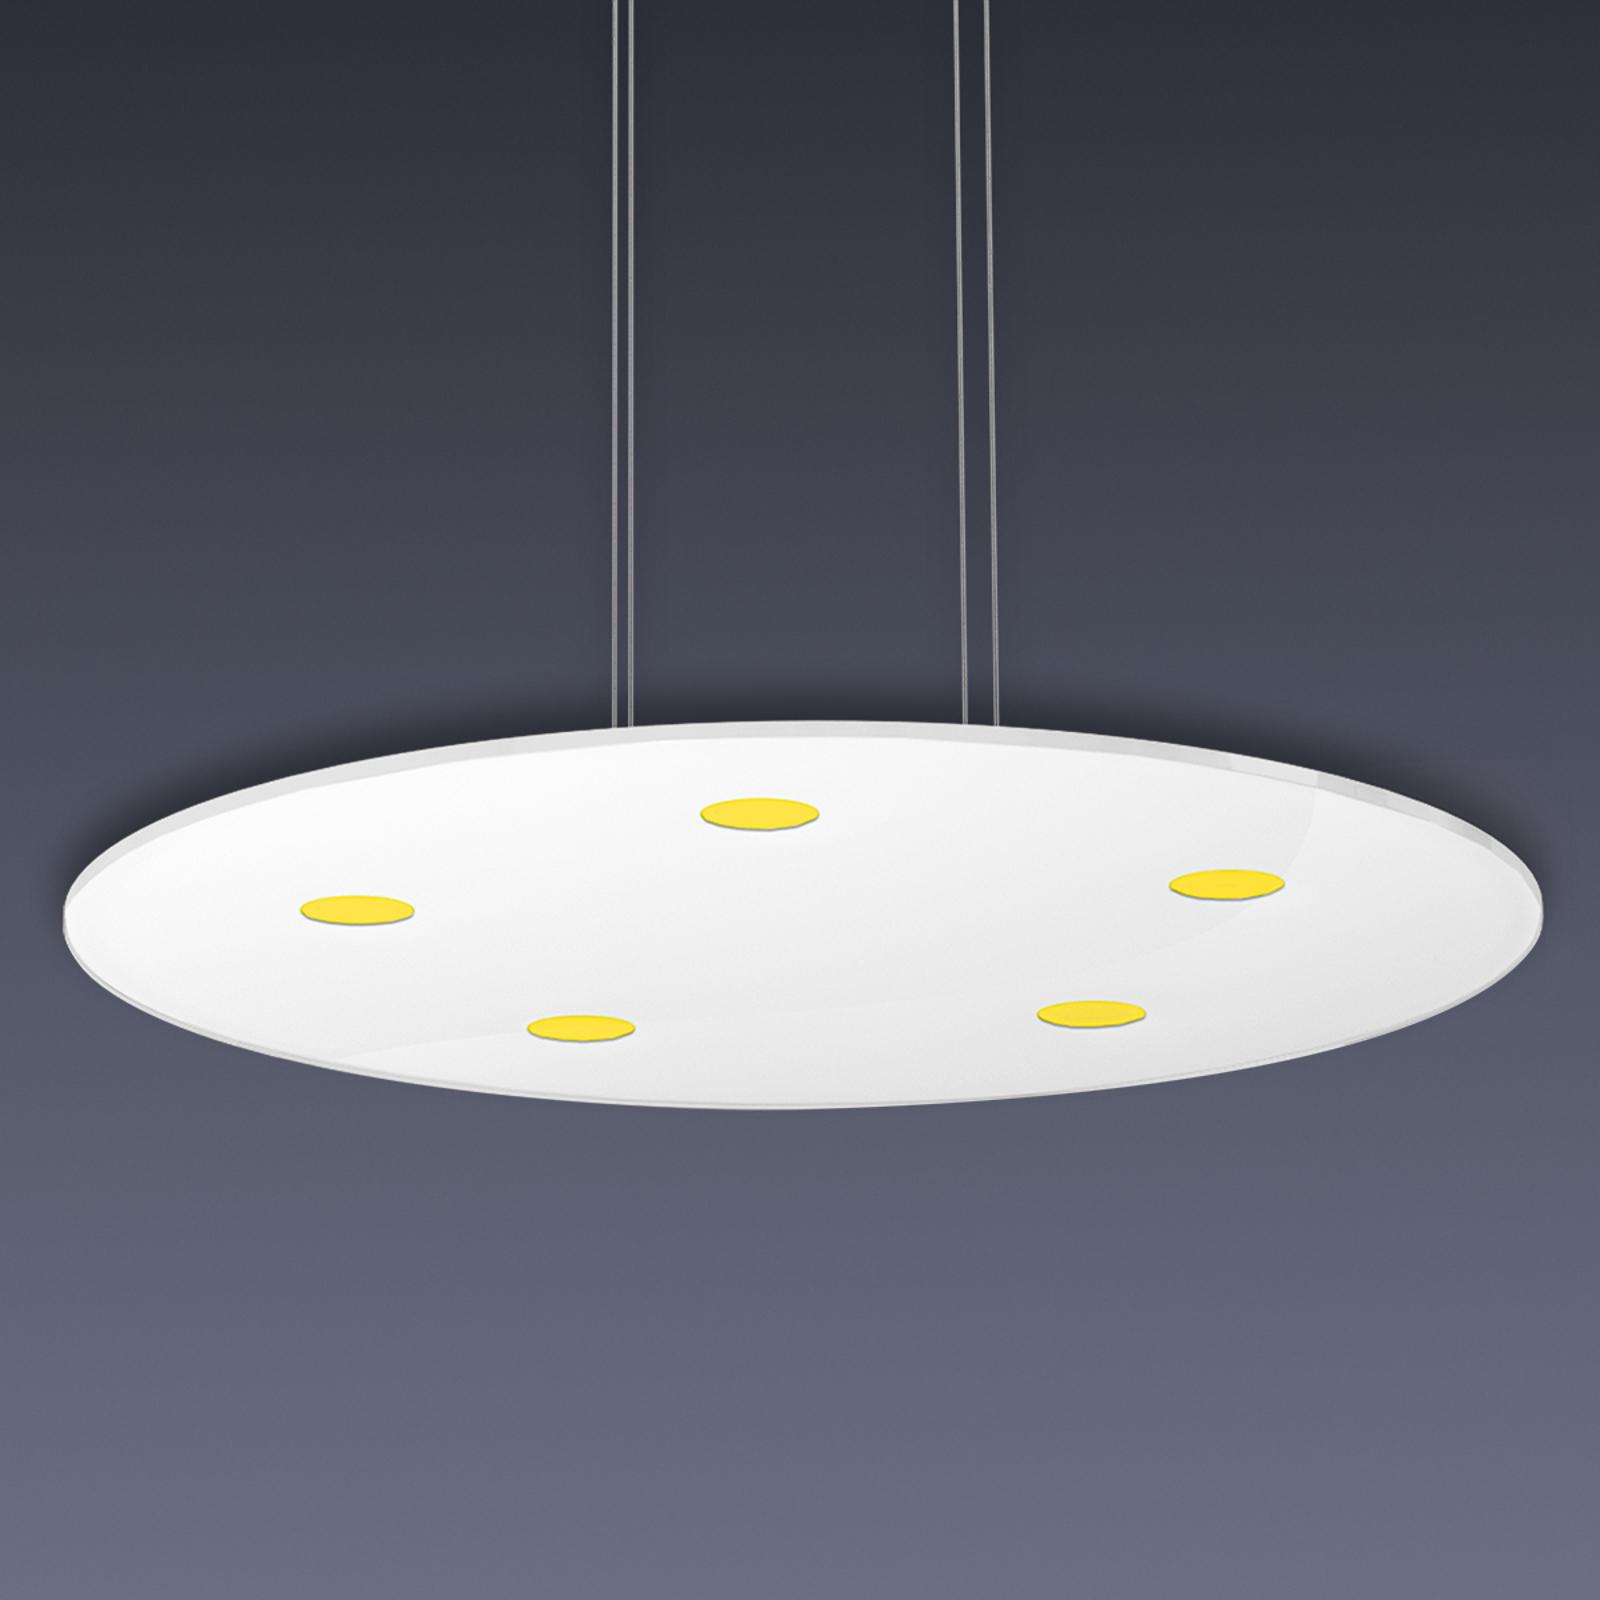 Rund LED-pendellampe Sunia med berøringsdimmer